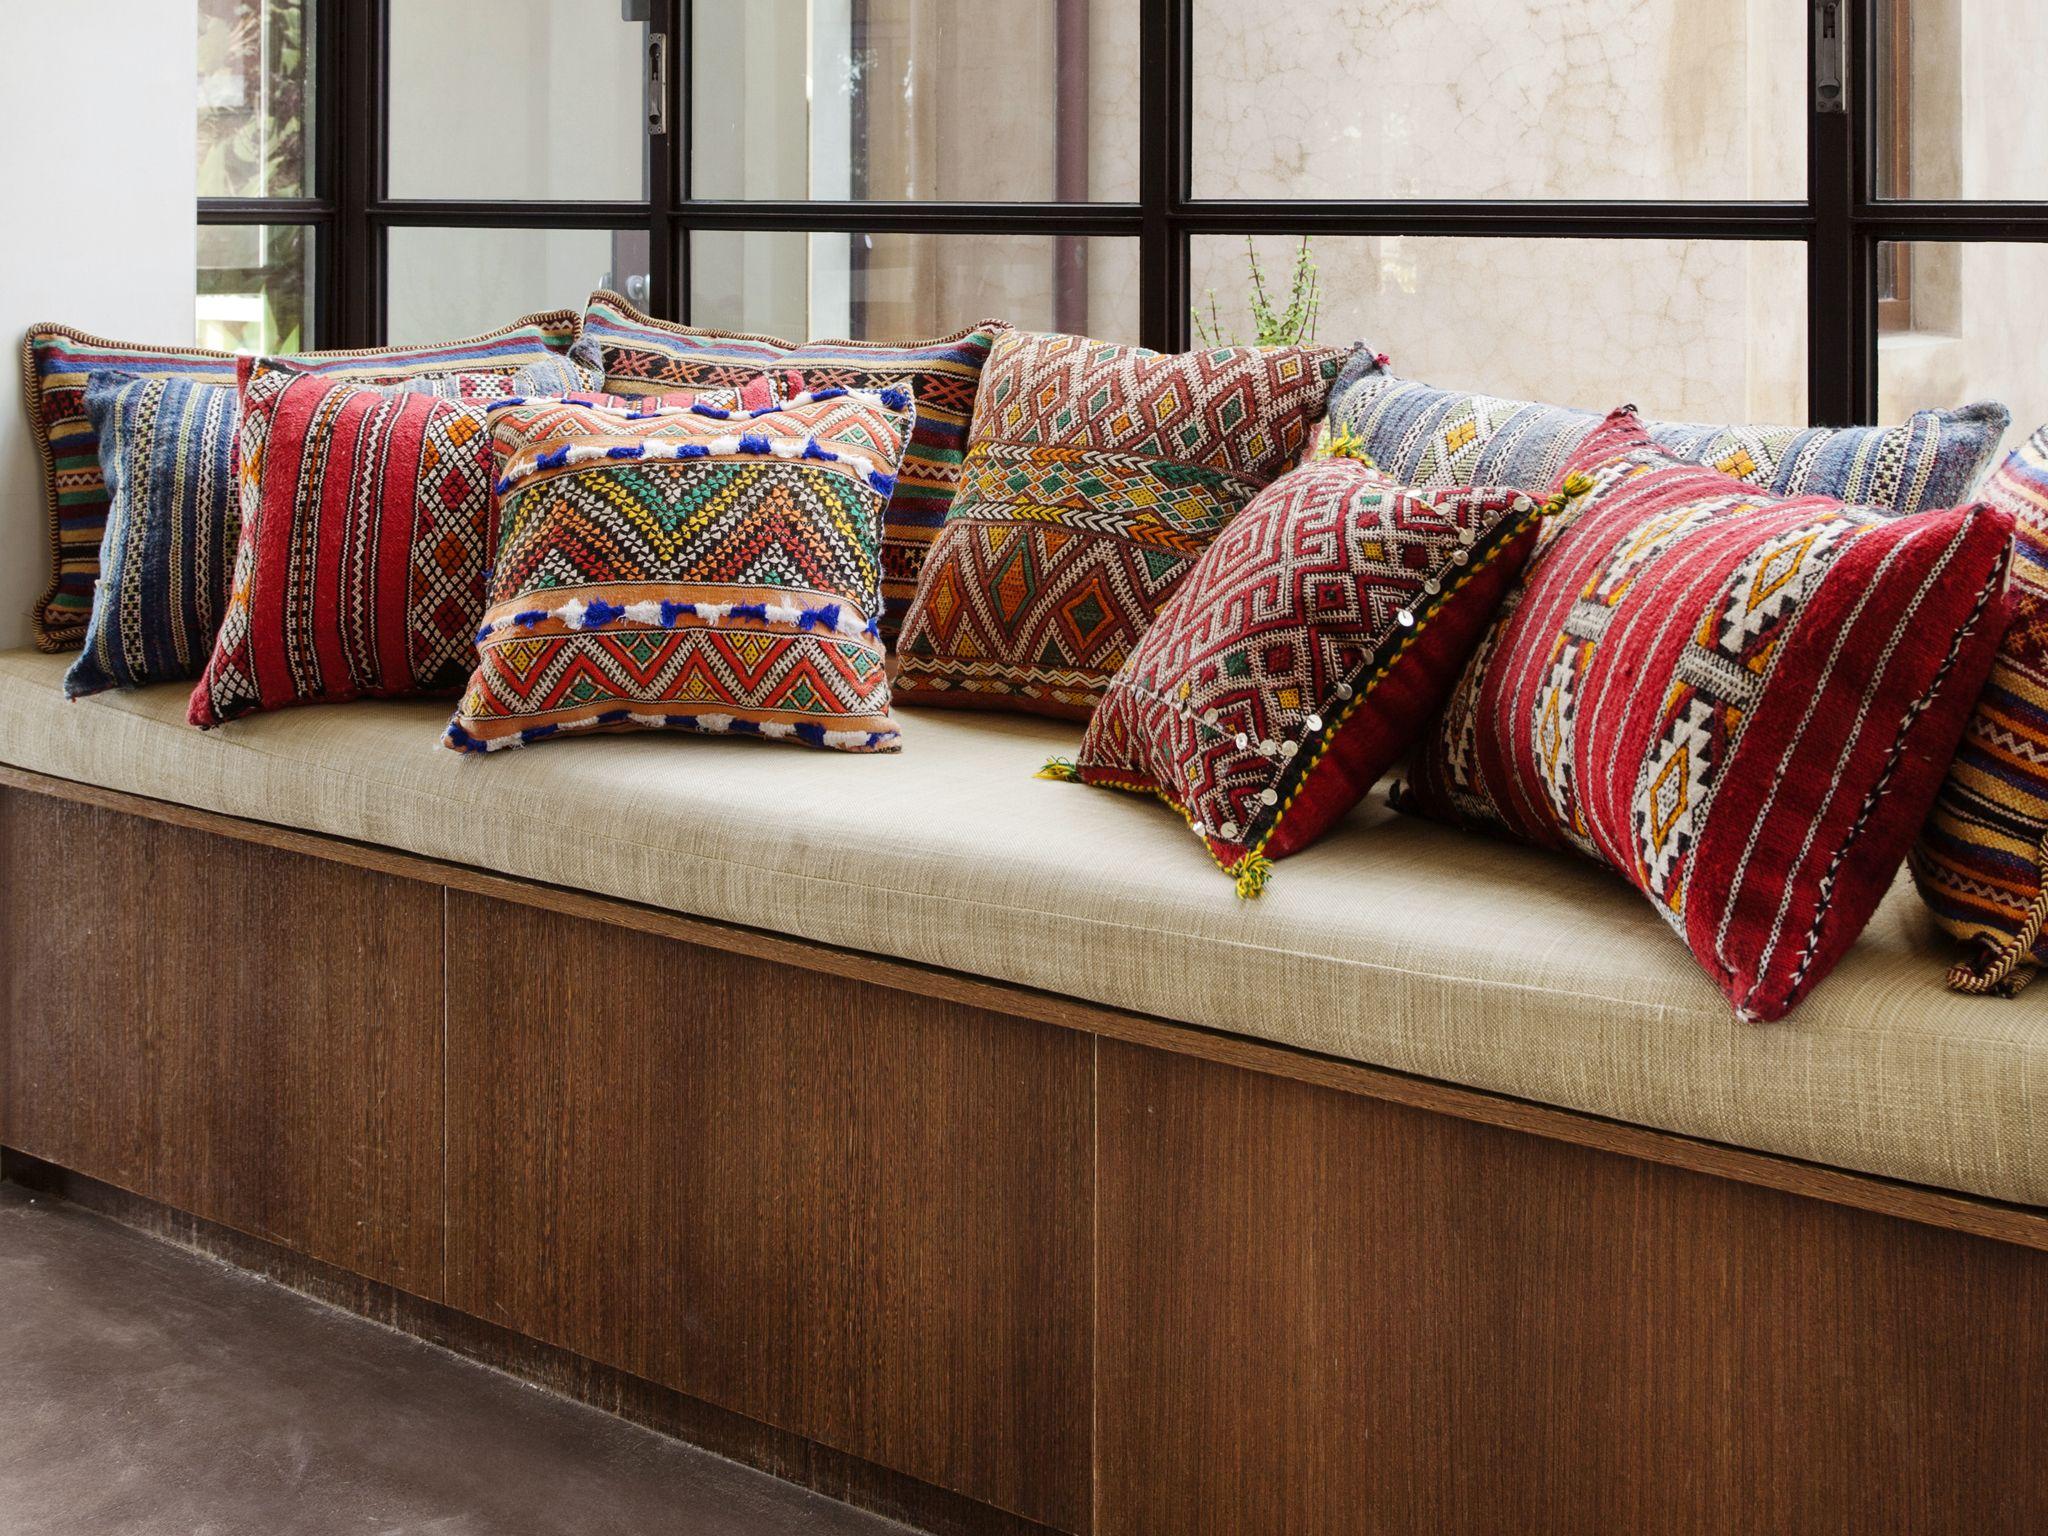 Bohemian Love Berber Cushions Barefoot Gypsy